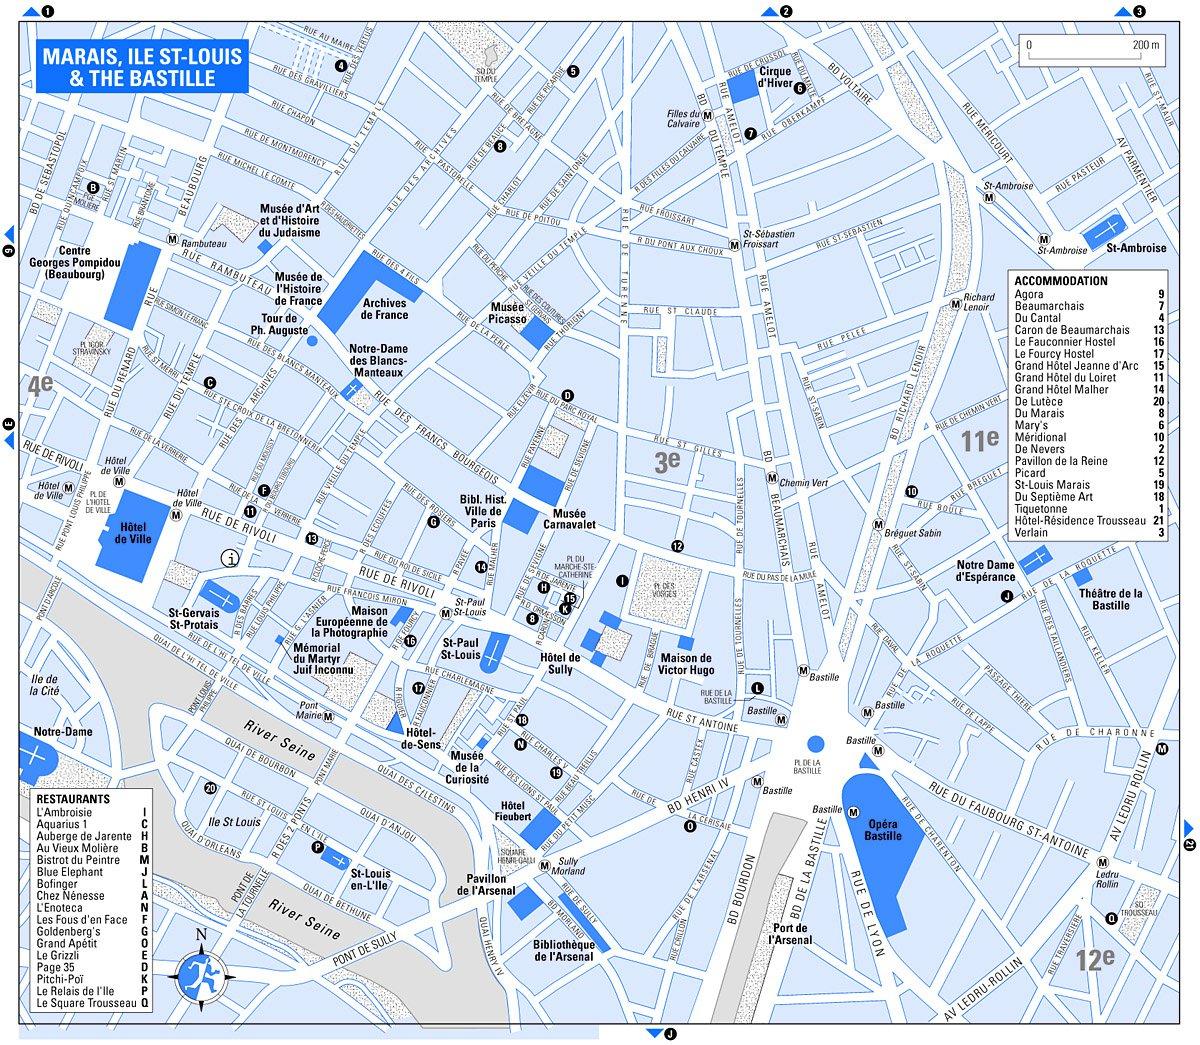 Карта схема района марэ площадь